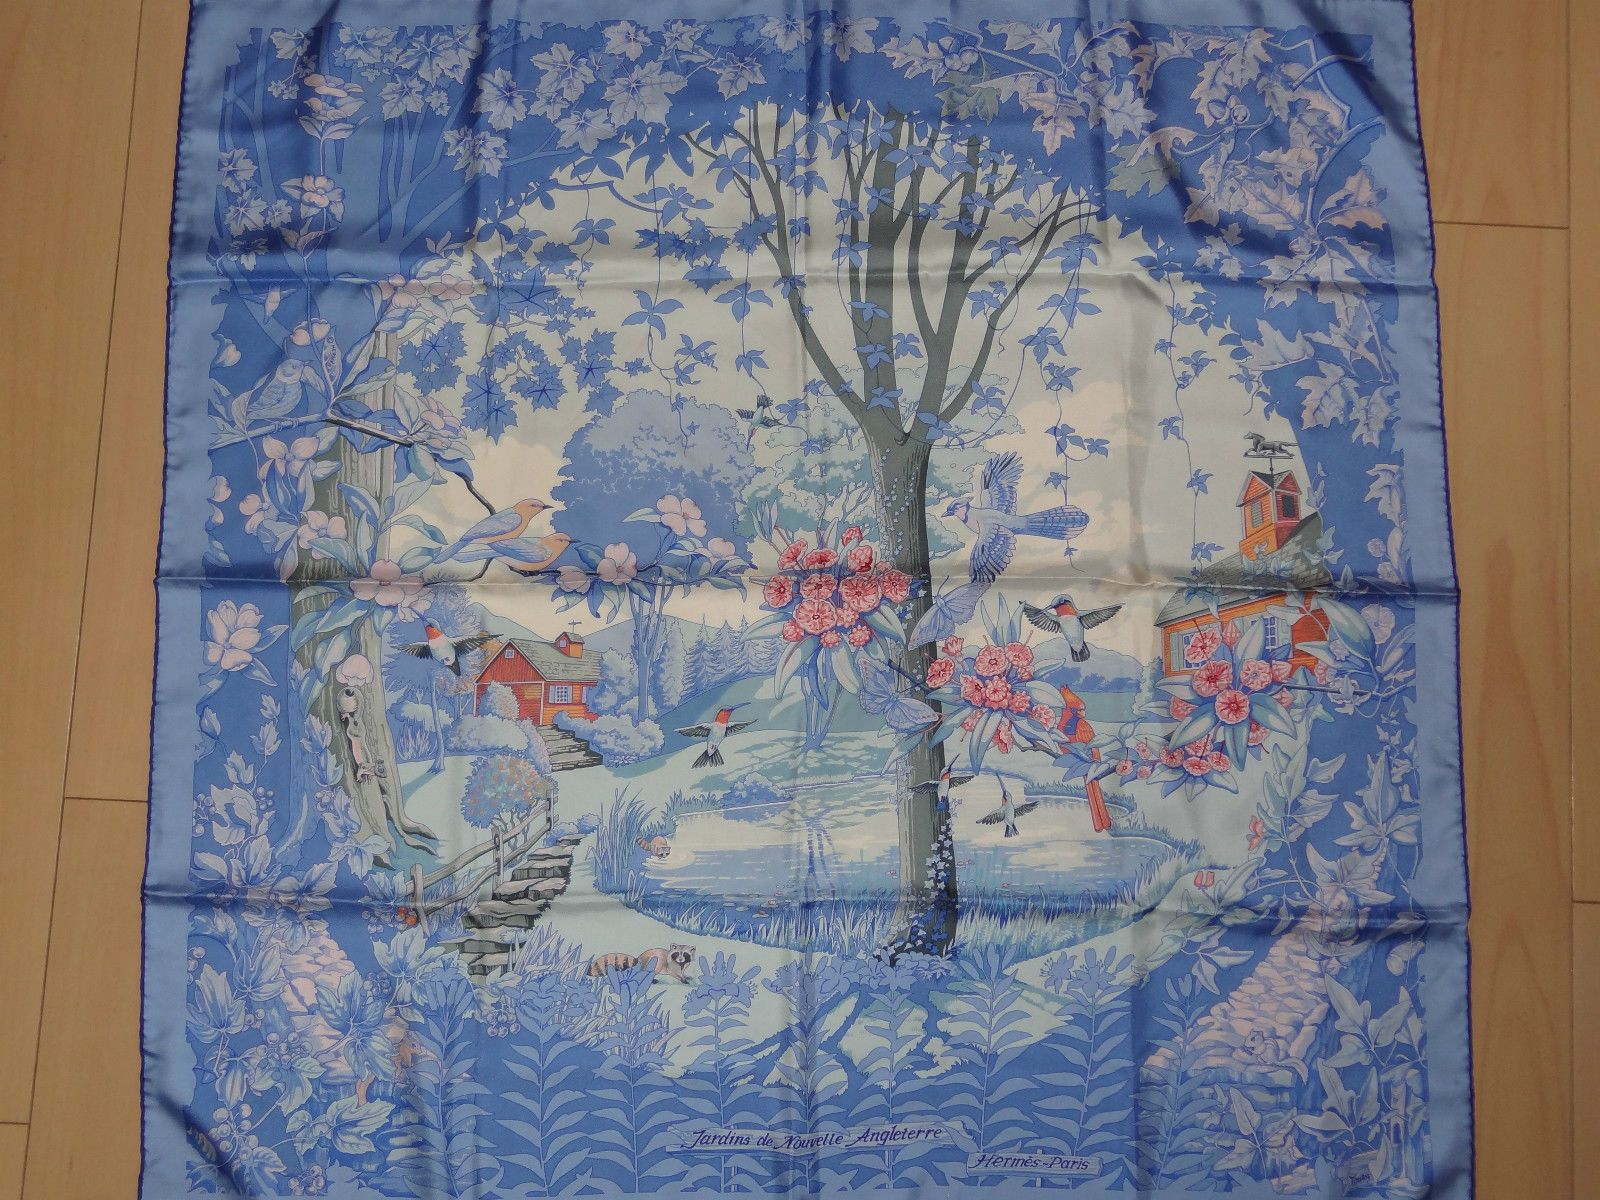 Auth Hermes ' Jardins de Nouvelle Angleterre' Scarf | eBay ...